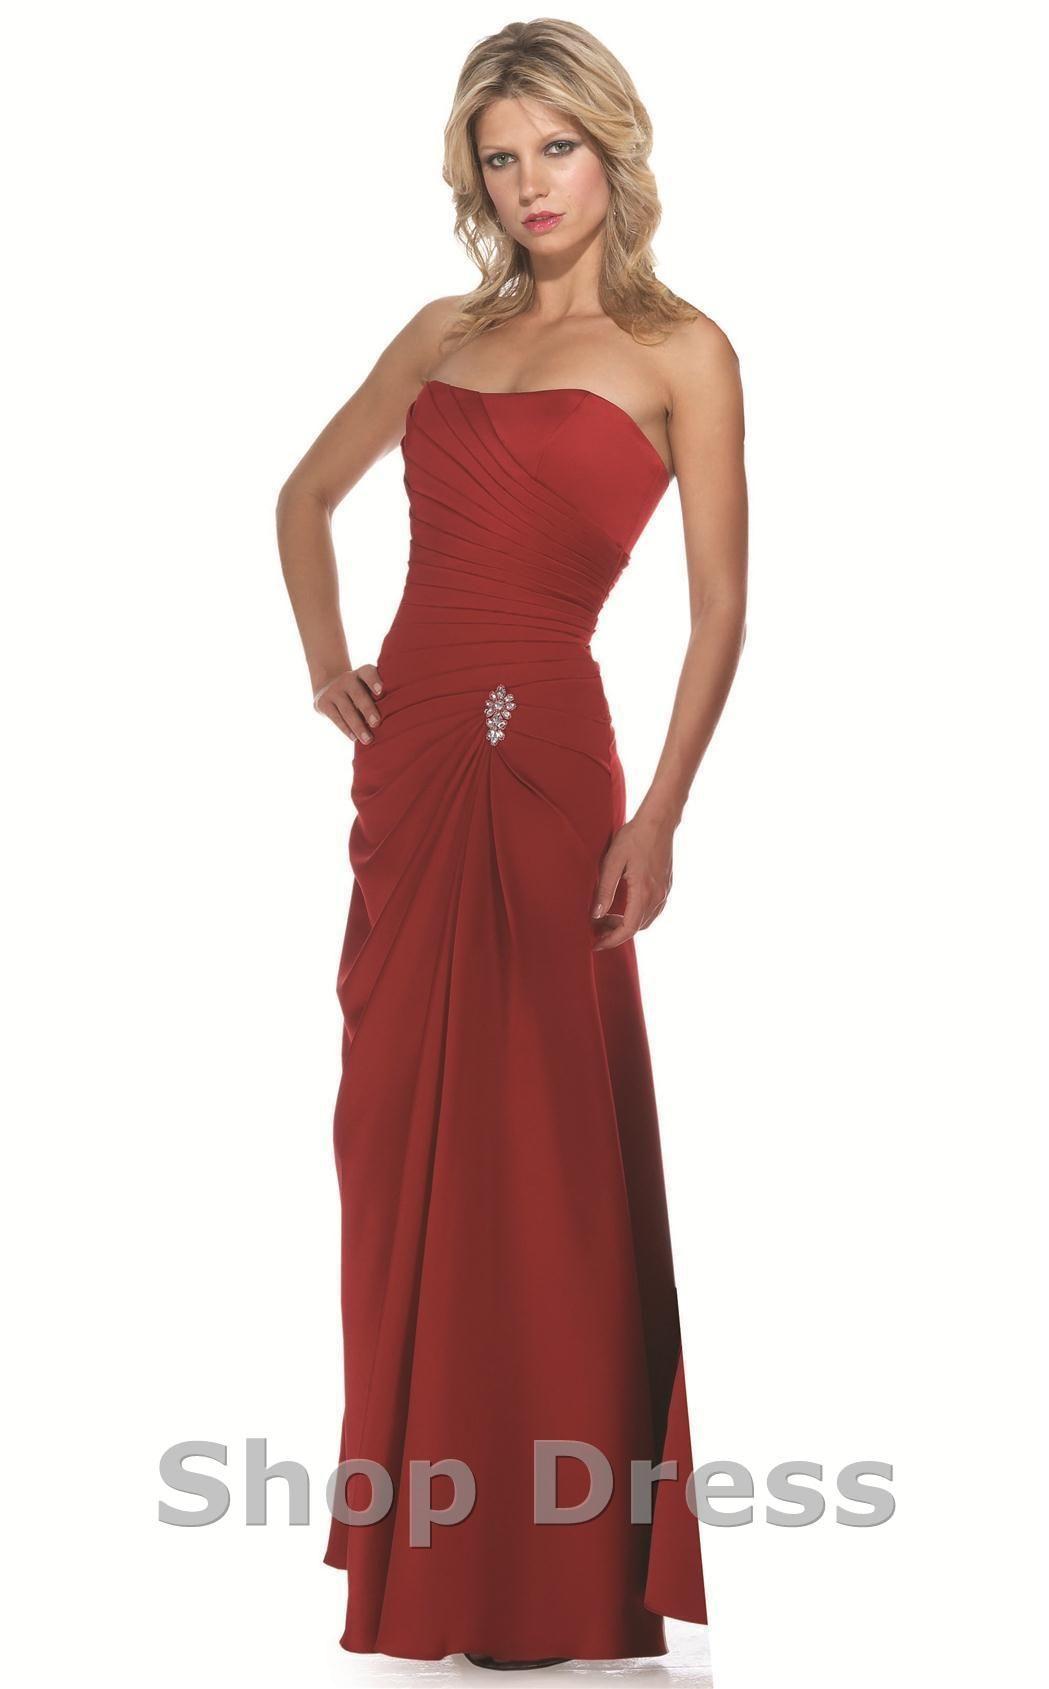 My Bridesmaids' dress :)